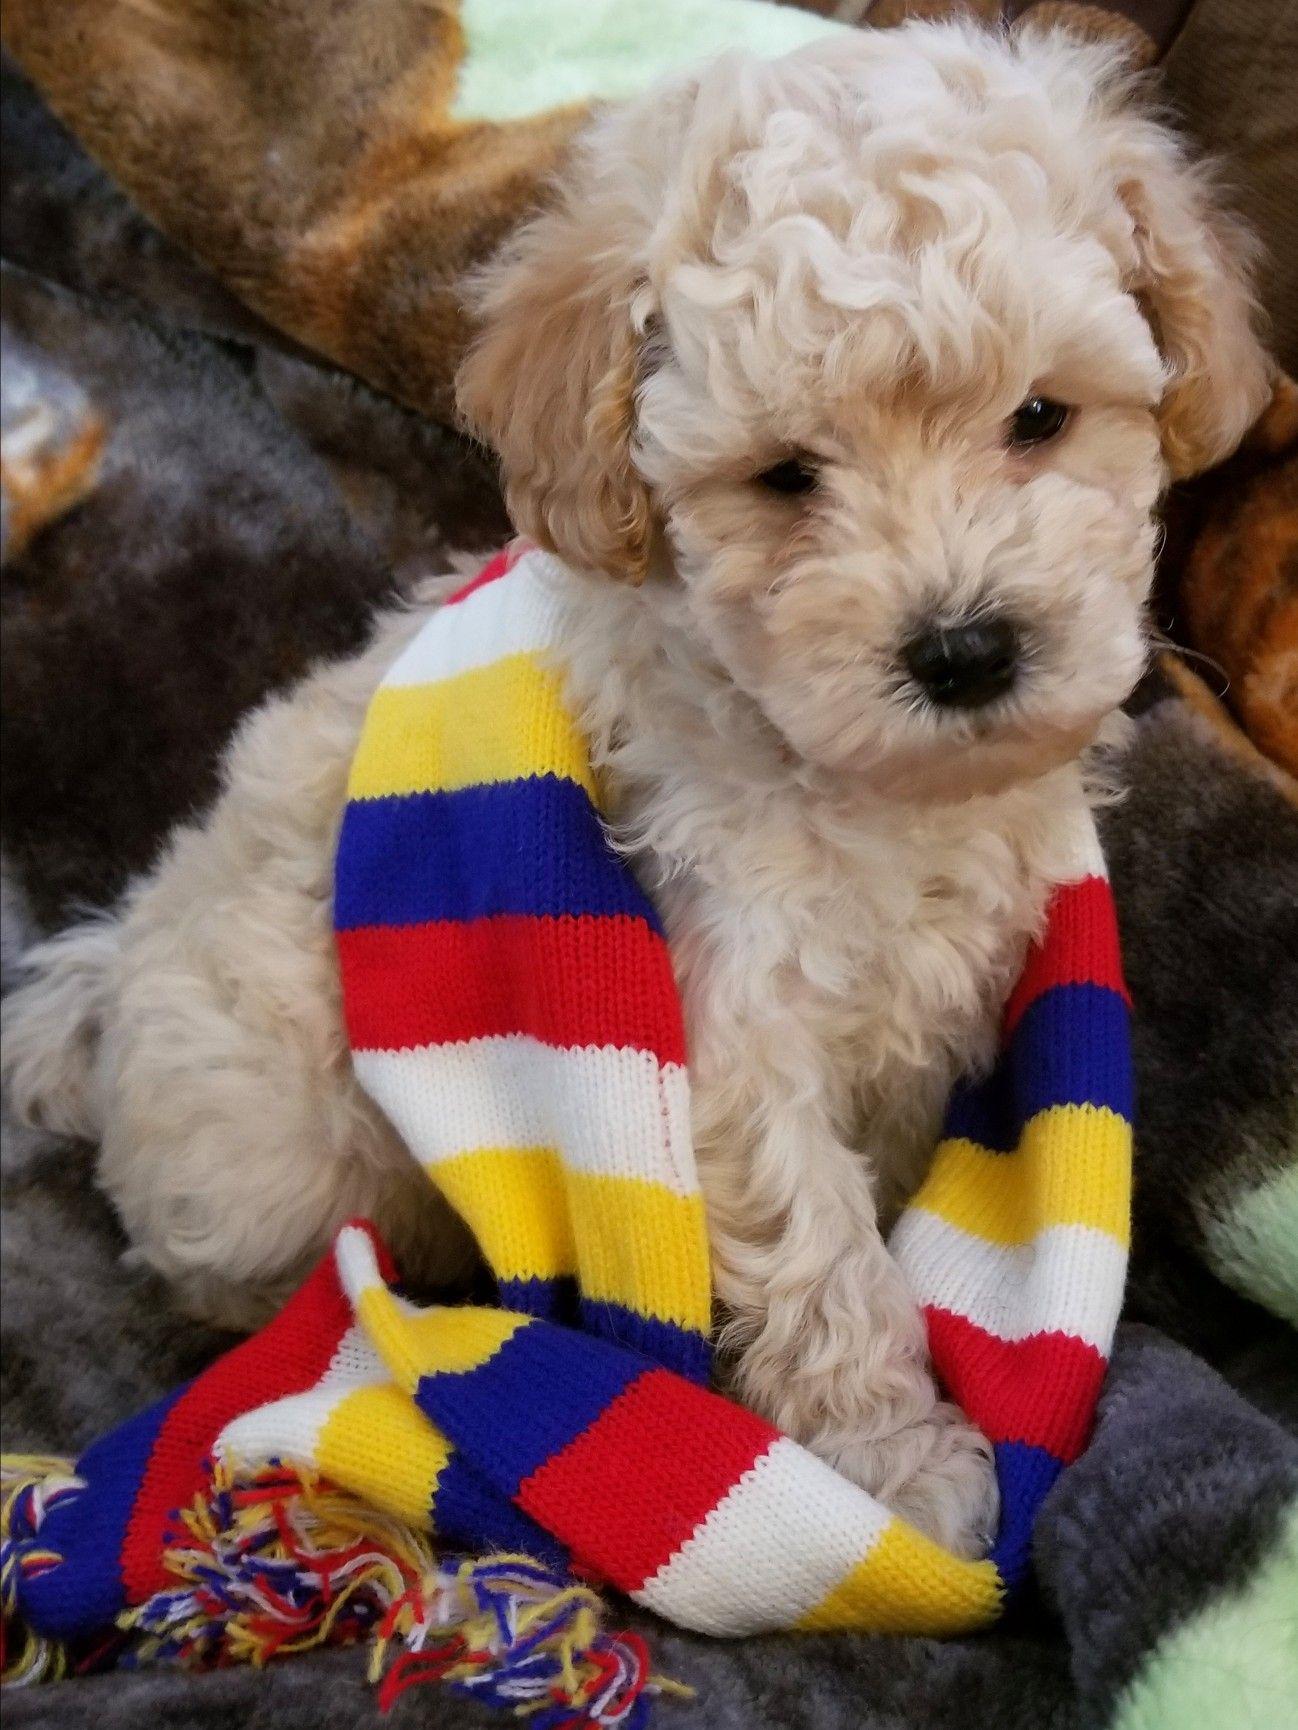 Maltipoo Puppy 2018 Johnsonsjewels Webs Com Maltipoo Puppies In Va Malti Poo Puppies Virginia Www J Maltipoo Puppy Maltipoo Puppies For Sale Maltese Poodle Mix